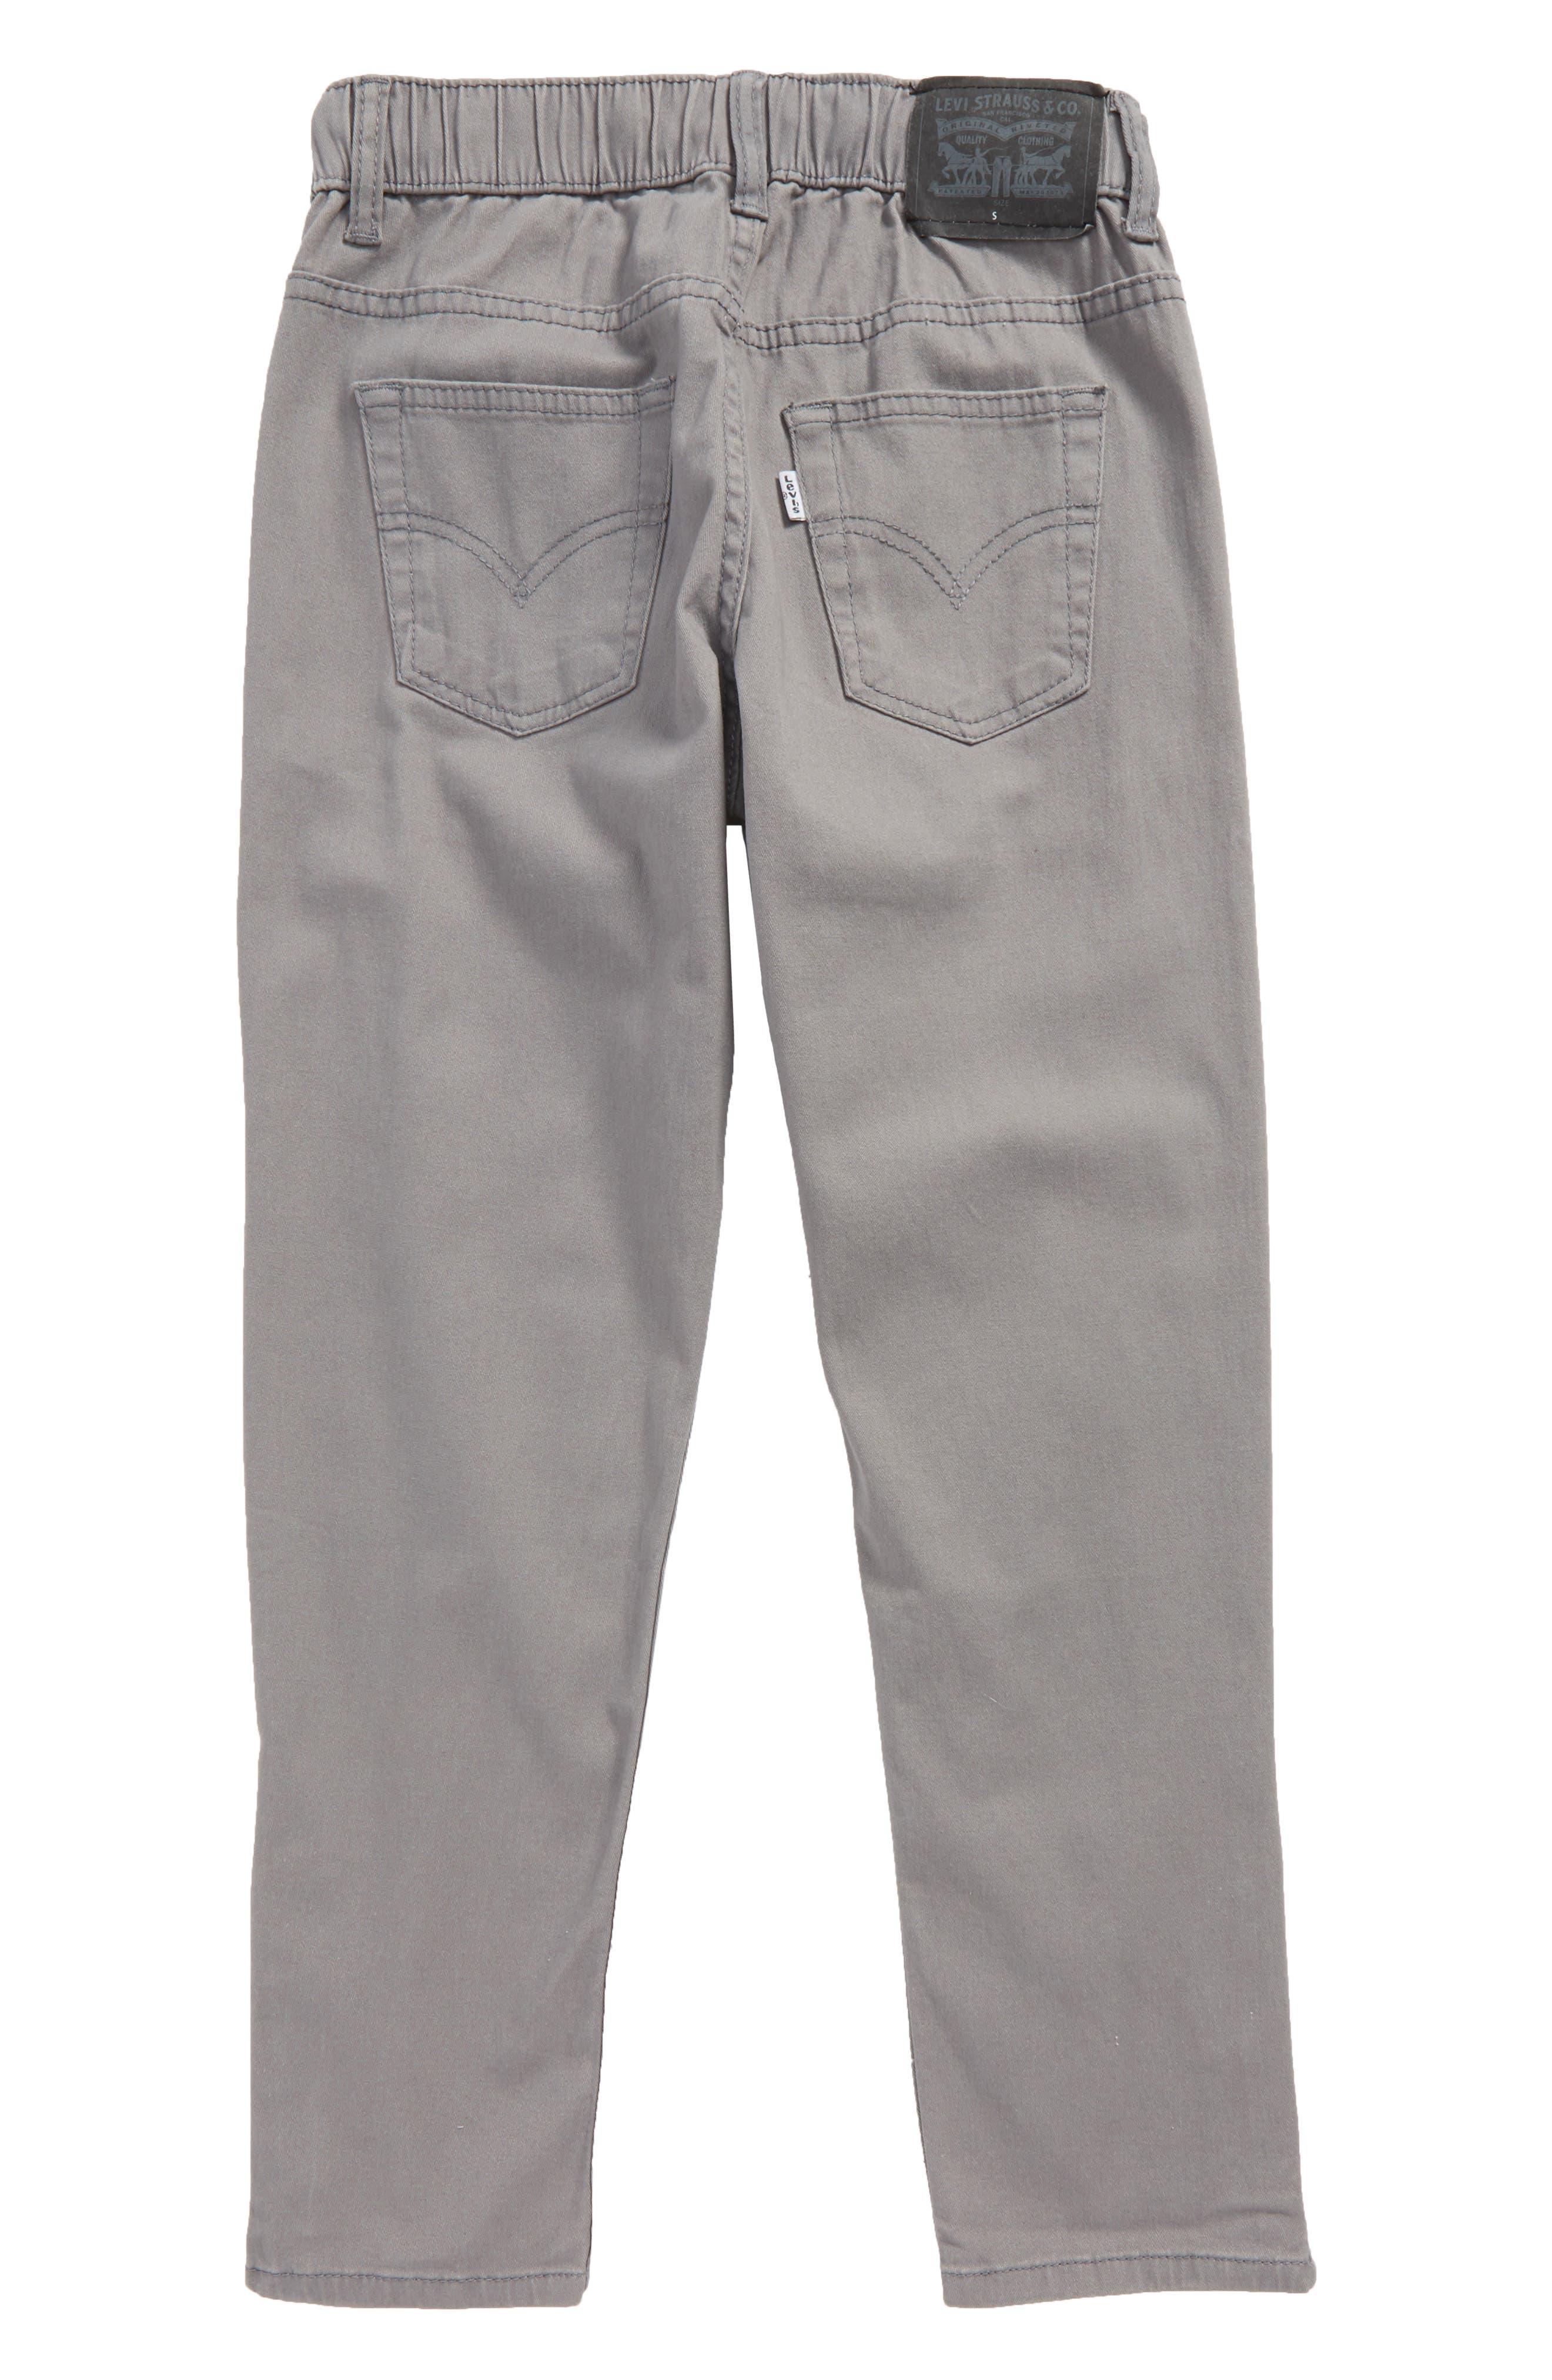 Alternate Image 2  - Levi's® Zip Cuff Pull-On Pants (Big Boys)